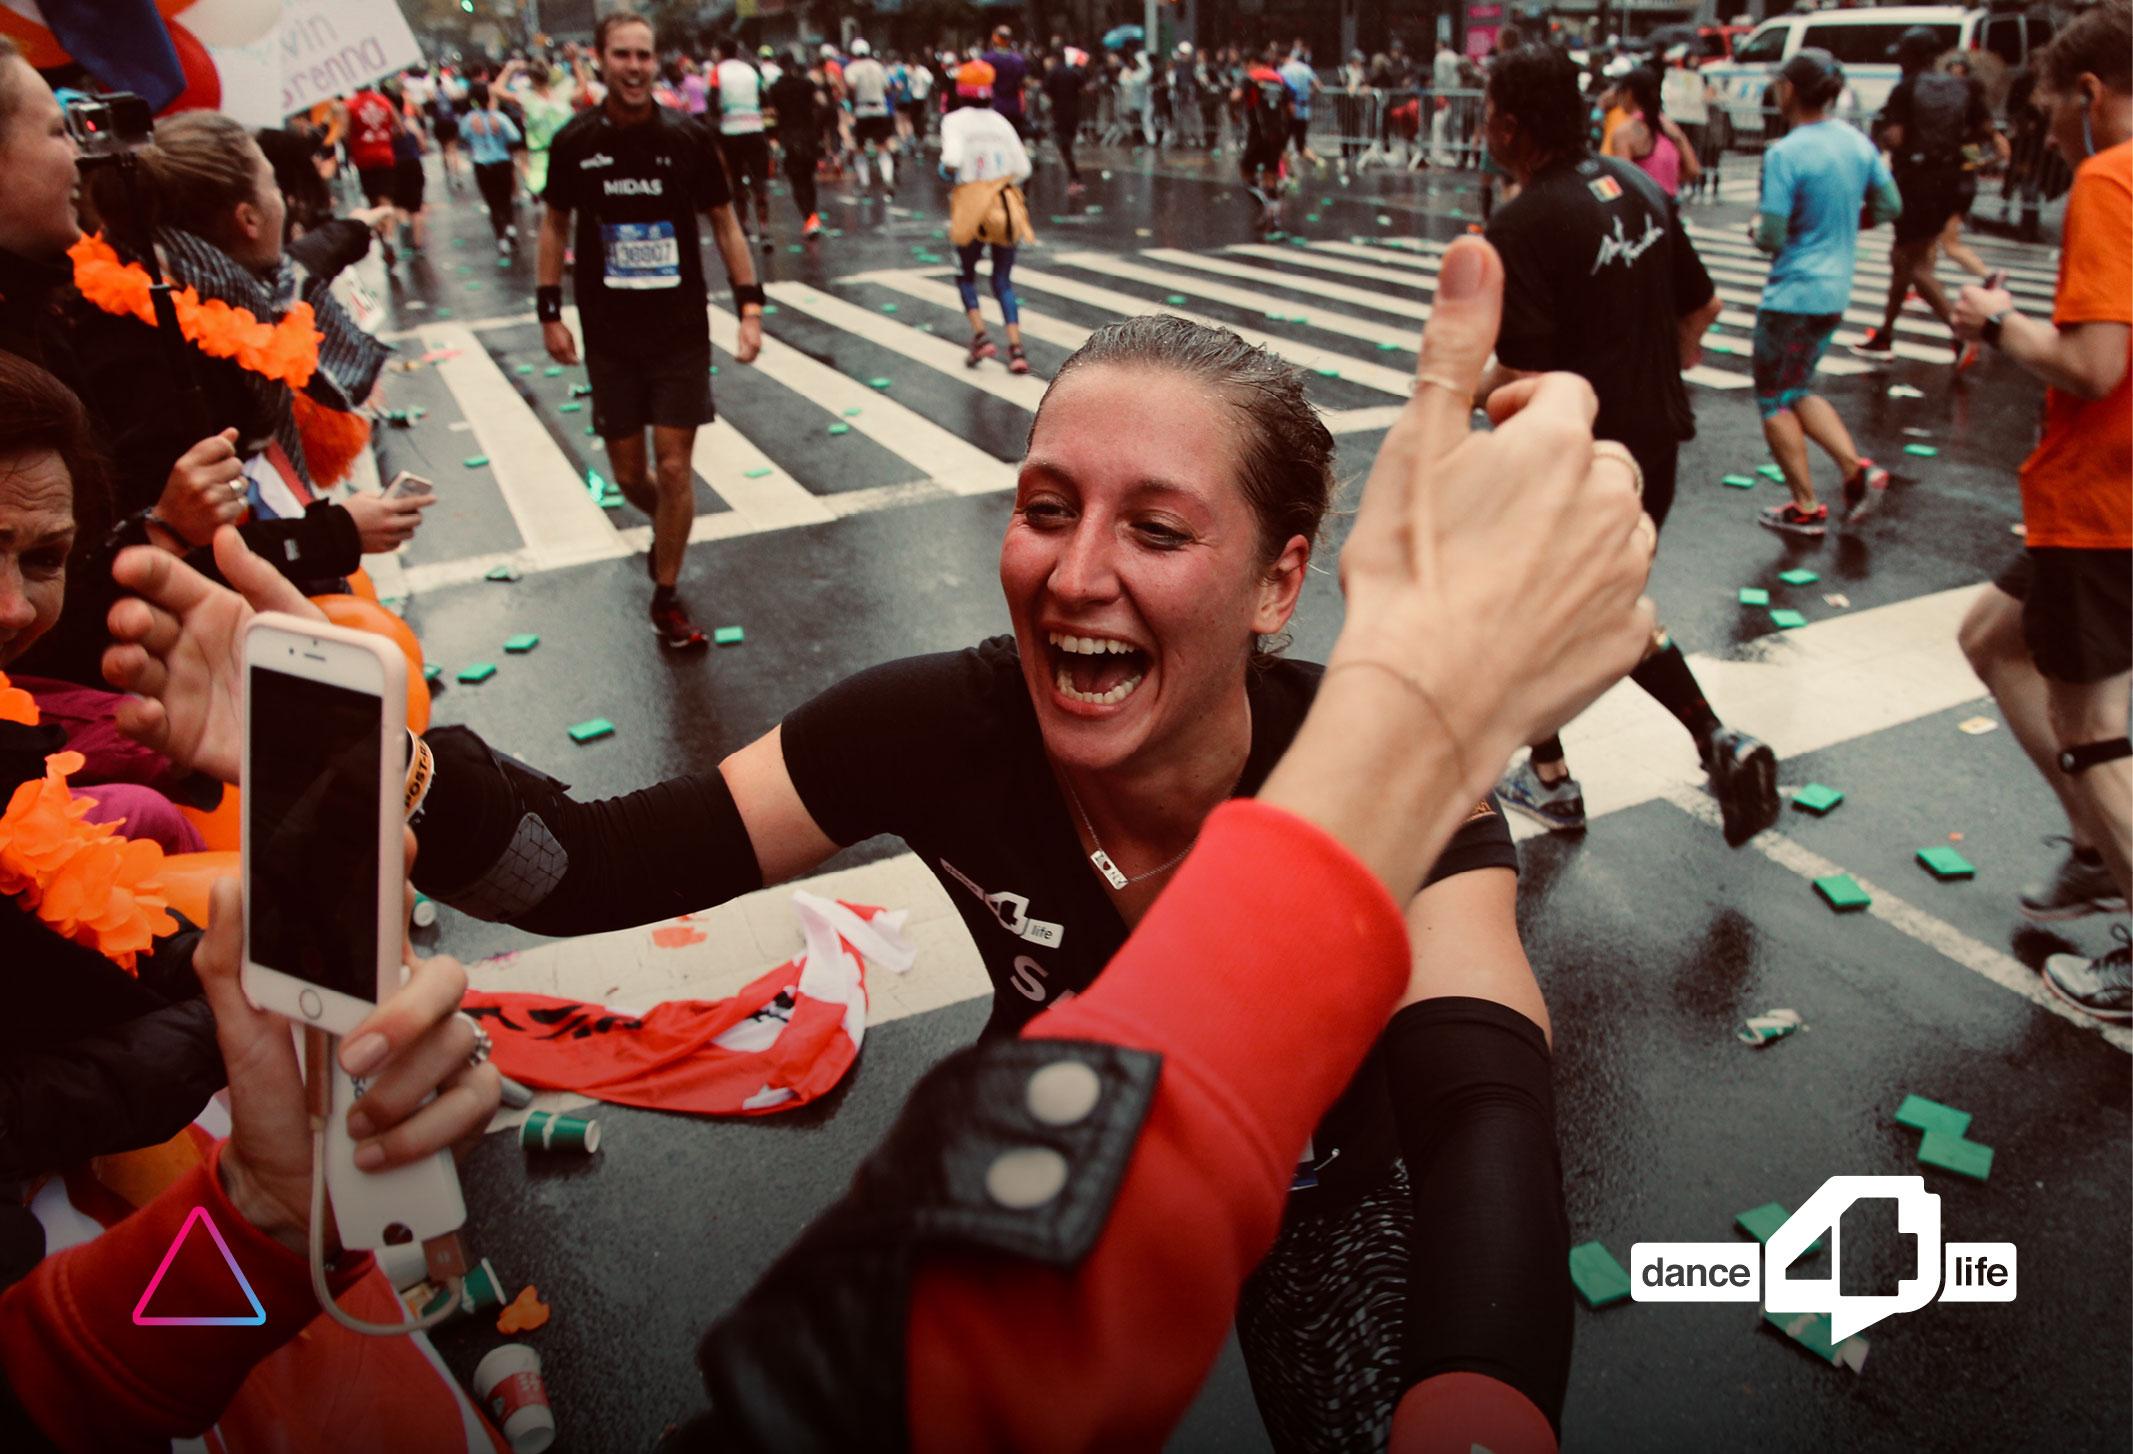 Advidi Joins Dance4Life to Run the 2018 New York Marathon